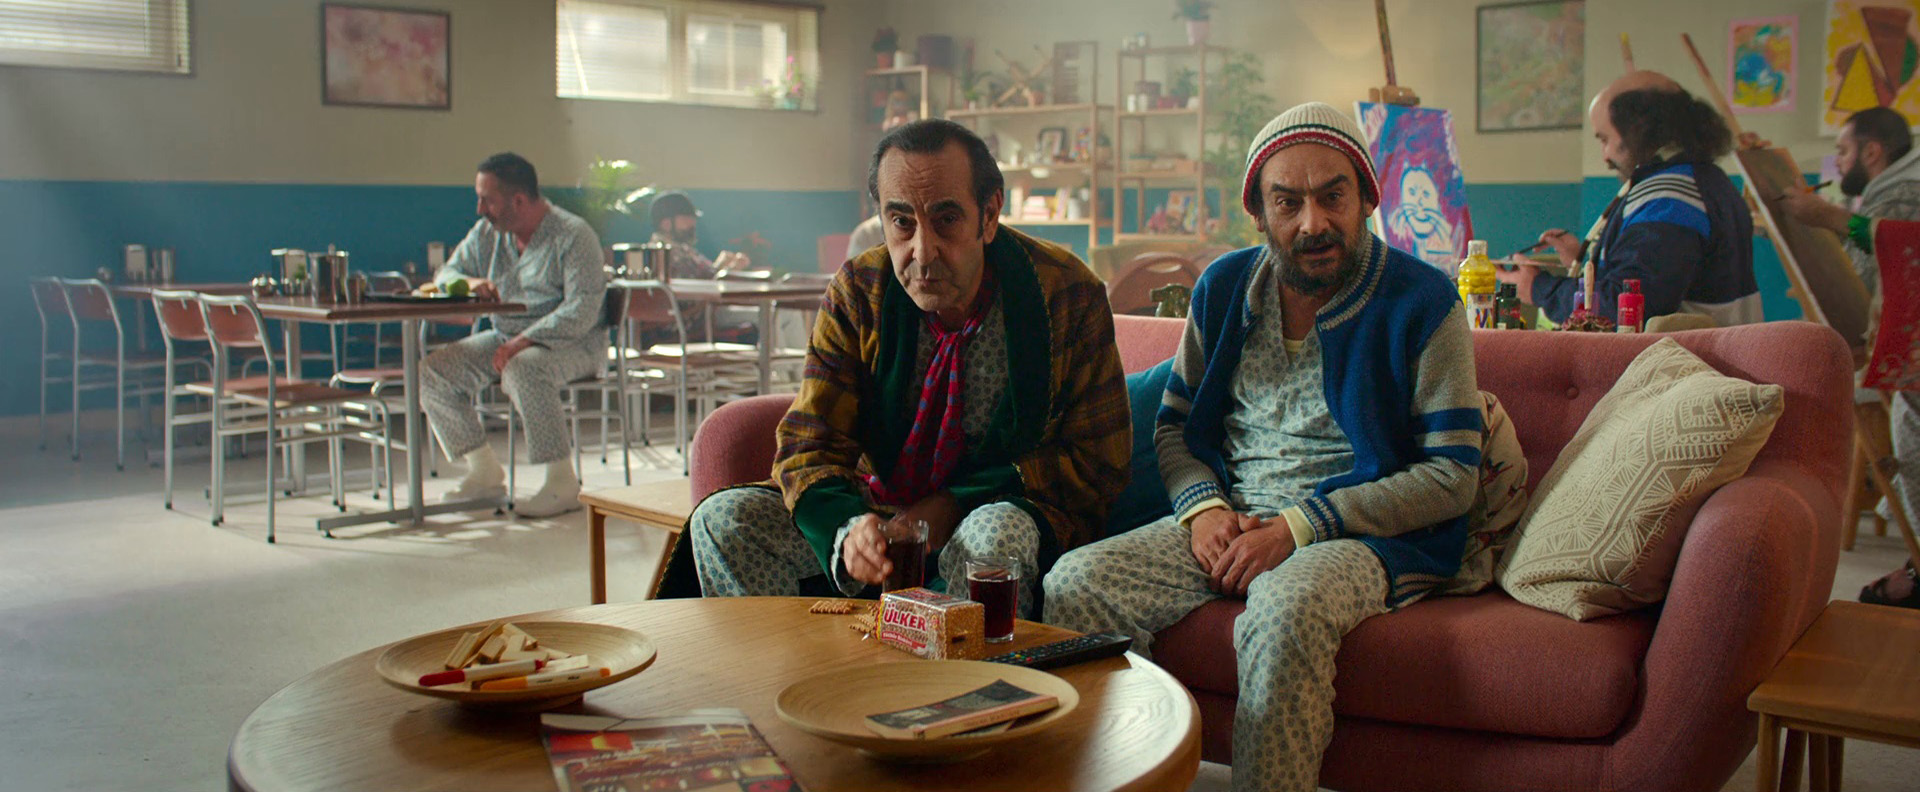 Karakomik Filmler 2: Deli - Emanet | 2020 | Yerli Film | NF | WEB-DL | XviD | Sansürsüz | 720p - 1080p - m720p - m1080p | WEB-DL | Tek Link